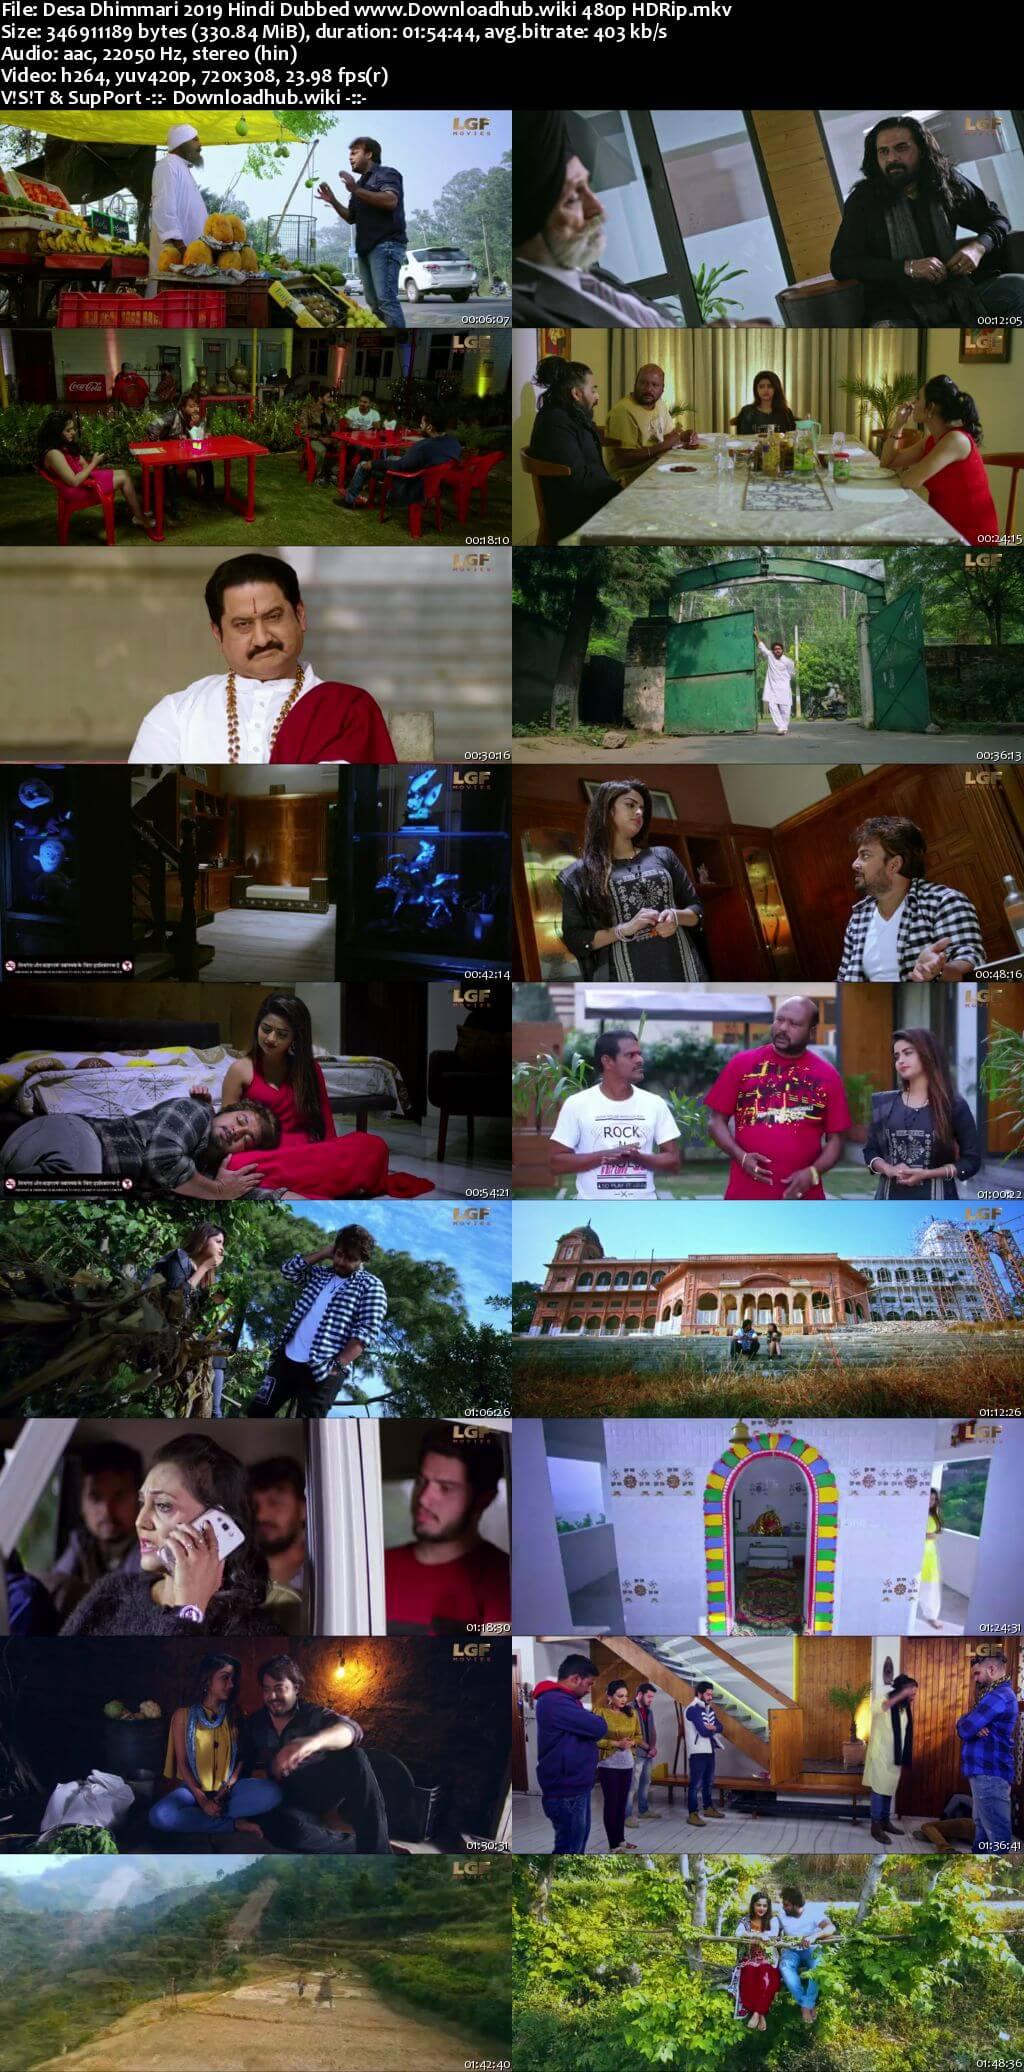 Desa Dhimmari 2019 Hindi Dubbed 300MB HDRip 480p